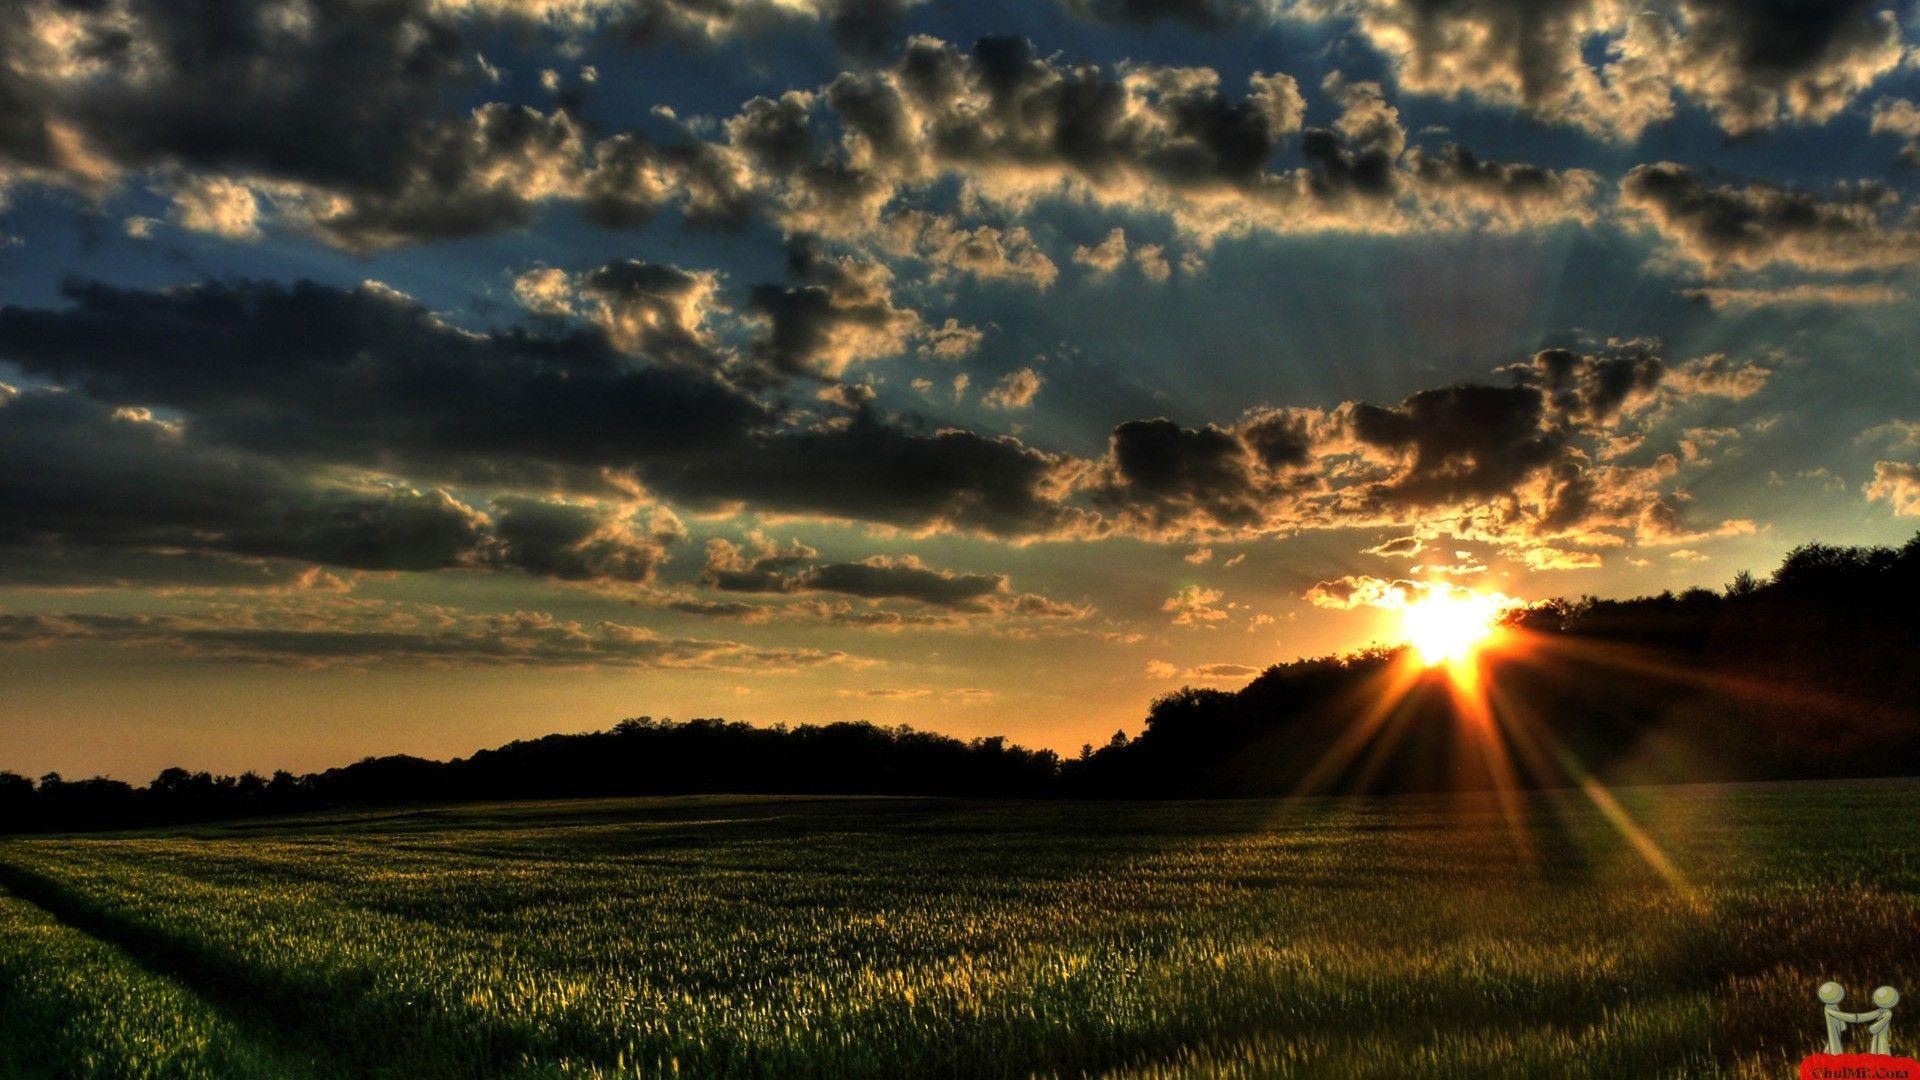 Beautiful Sunset Hd Wallpapers Hd Cool 7 HD Wallpapers